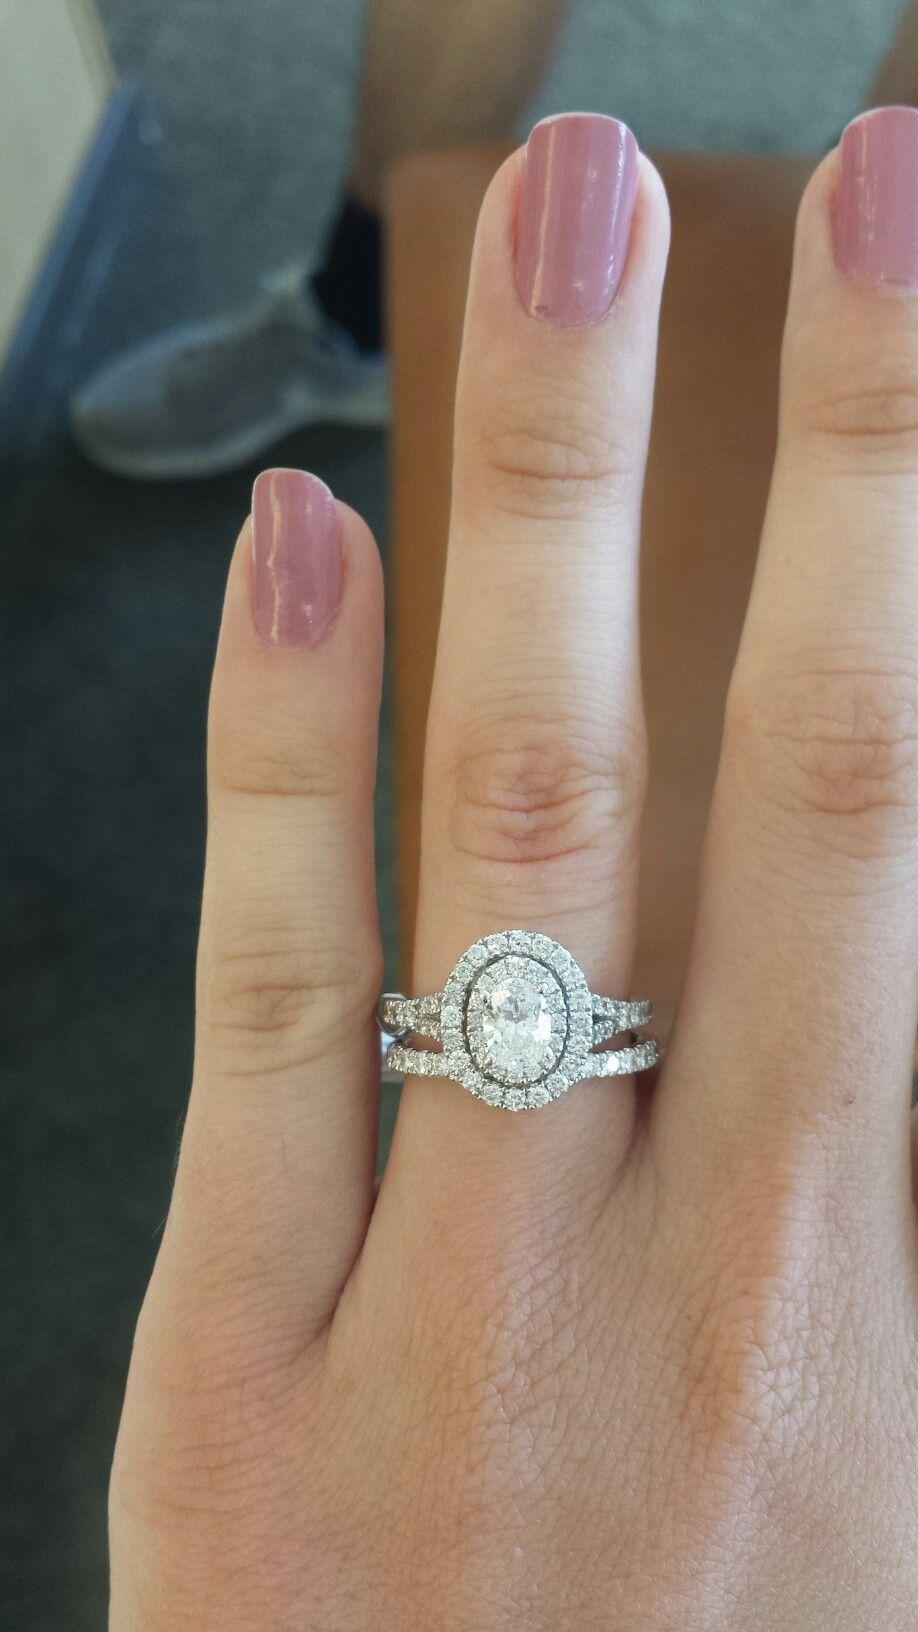 neil lane wedding bands Neil Lane Dimond Oval engagement rings Wedding band Double halo